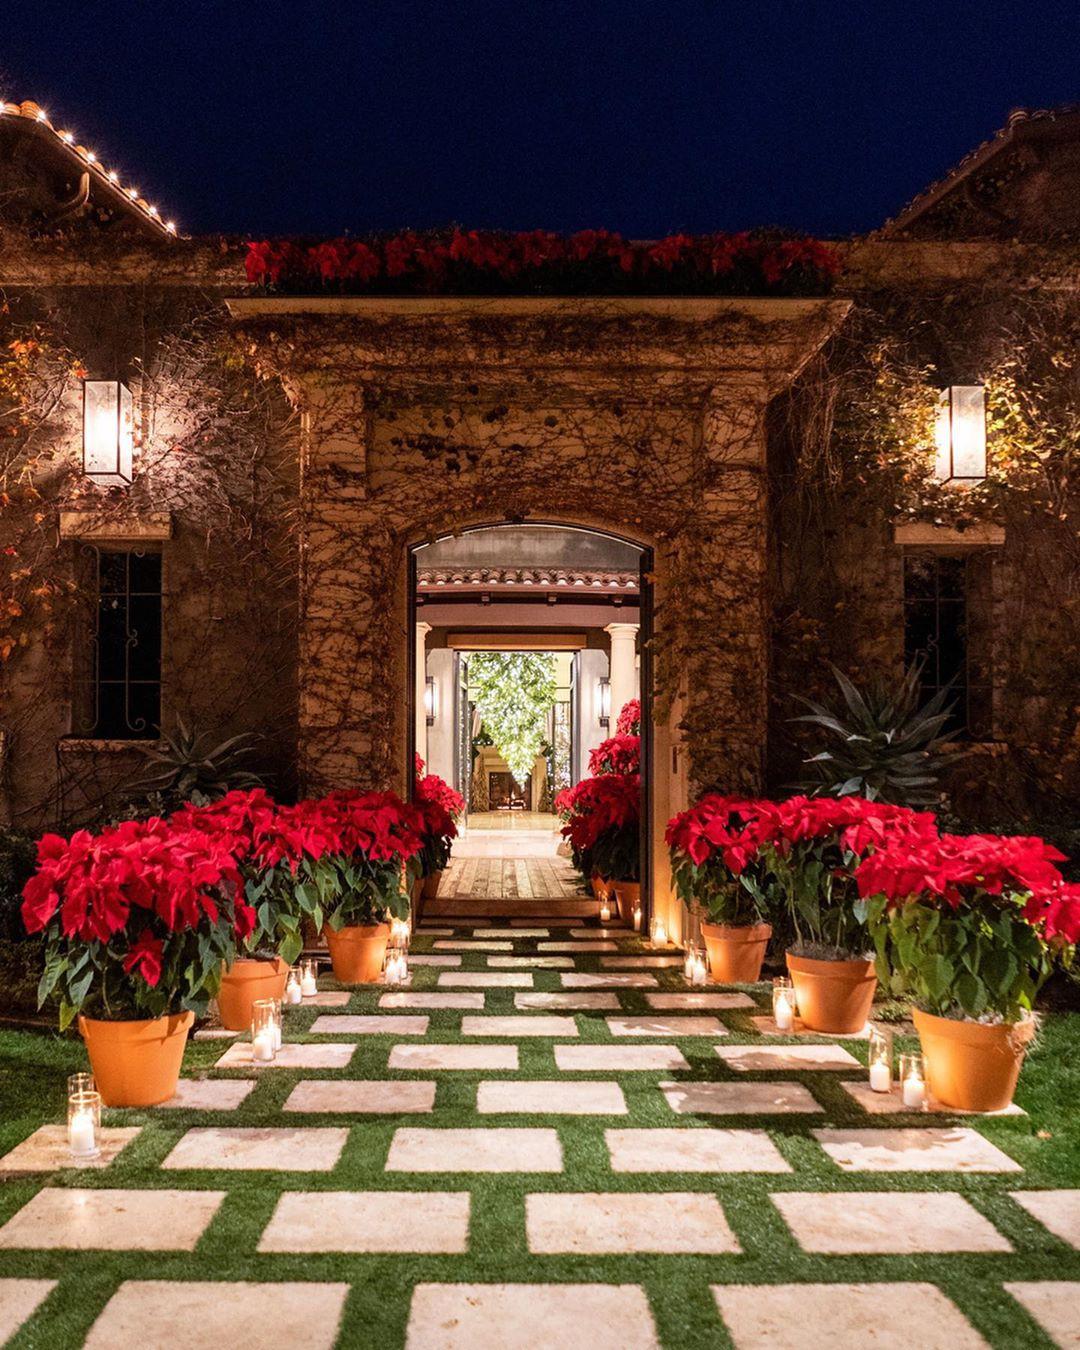 Kourtney Kardashian's Christmas-themed mansion